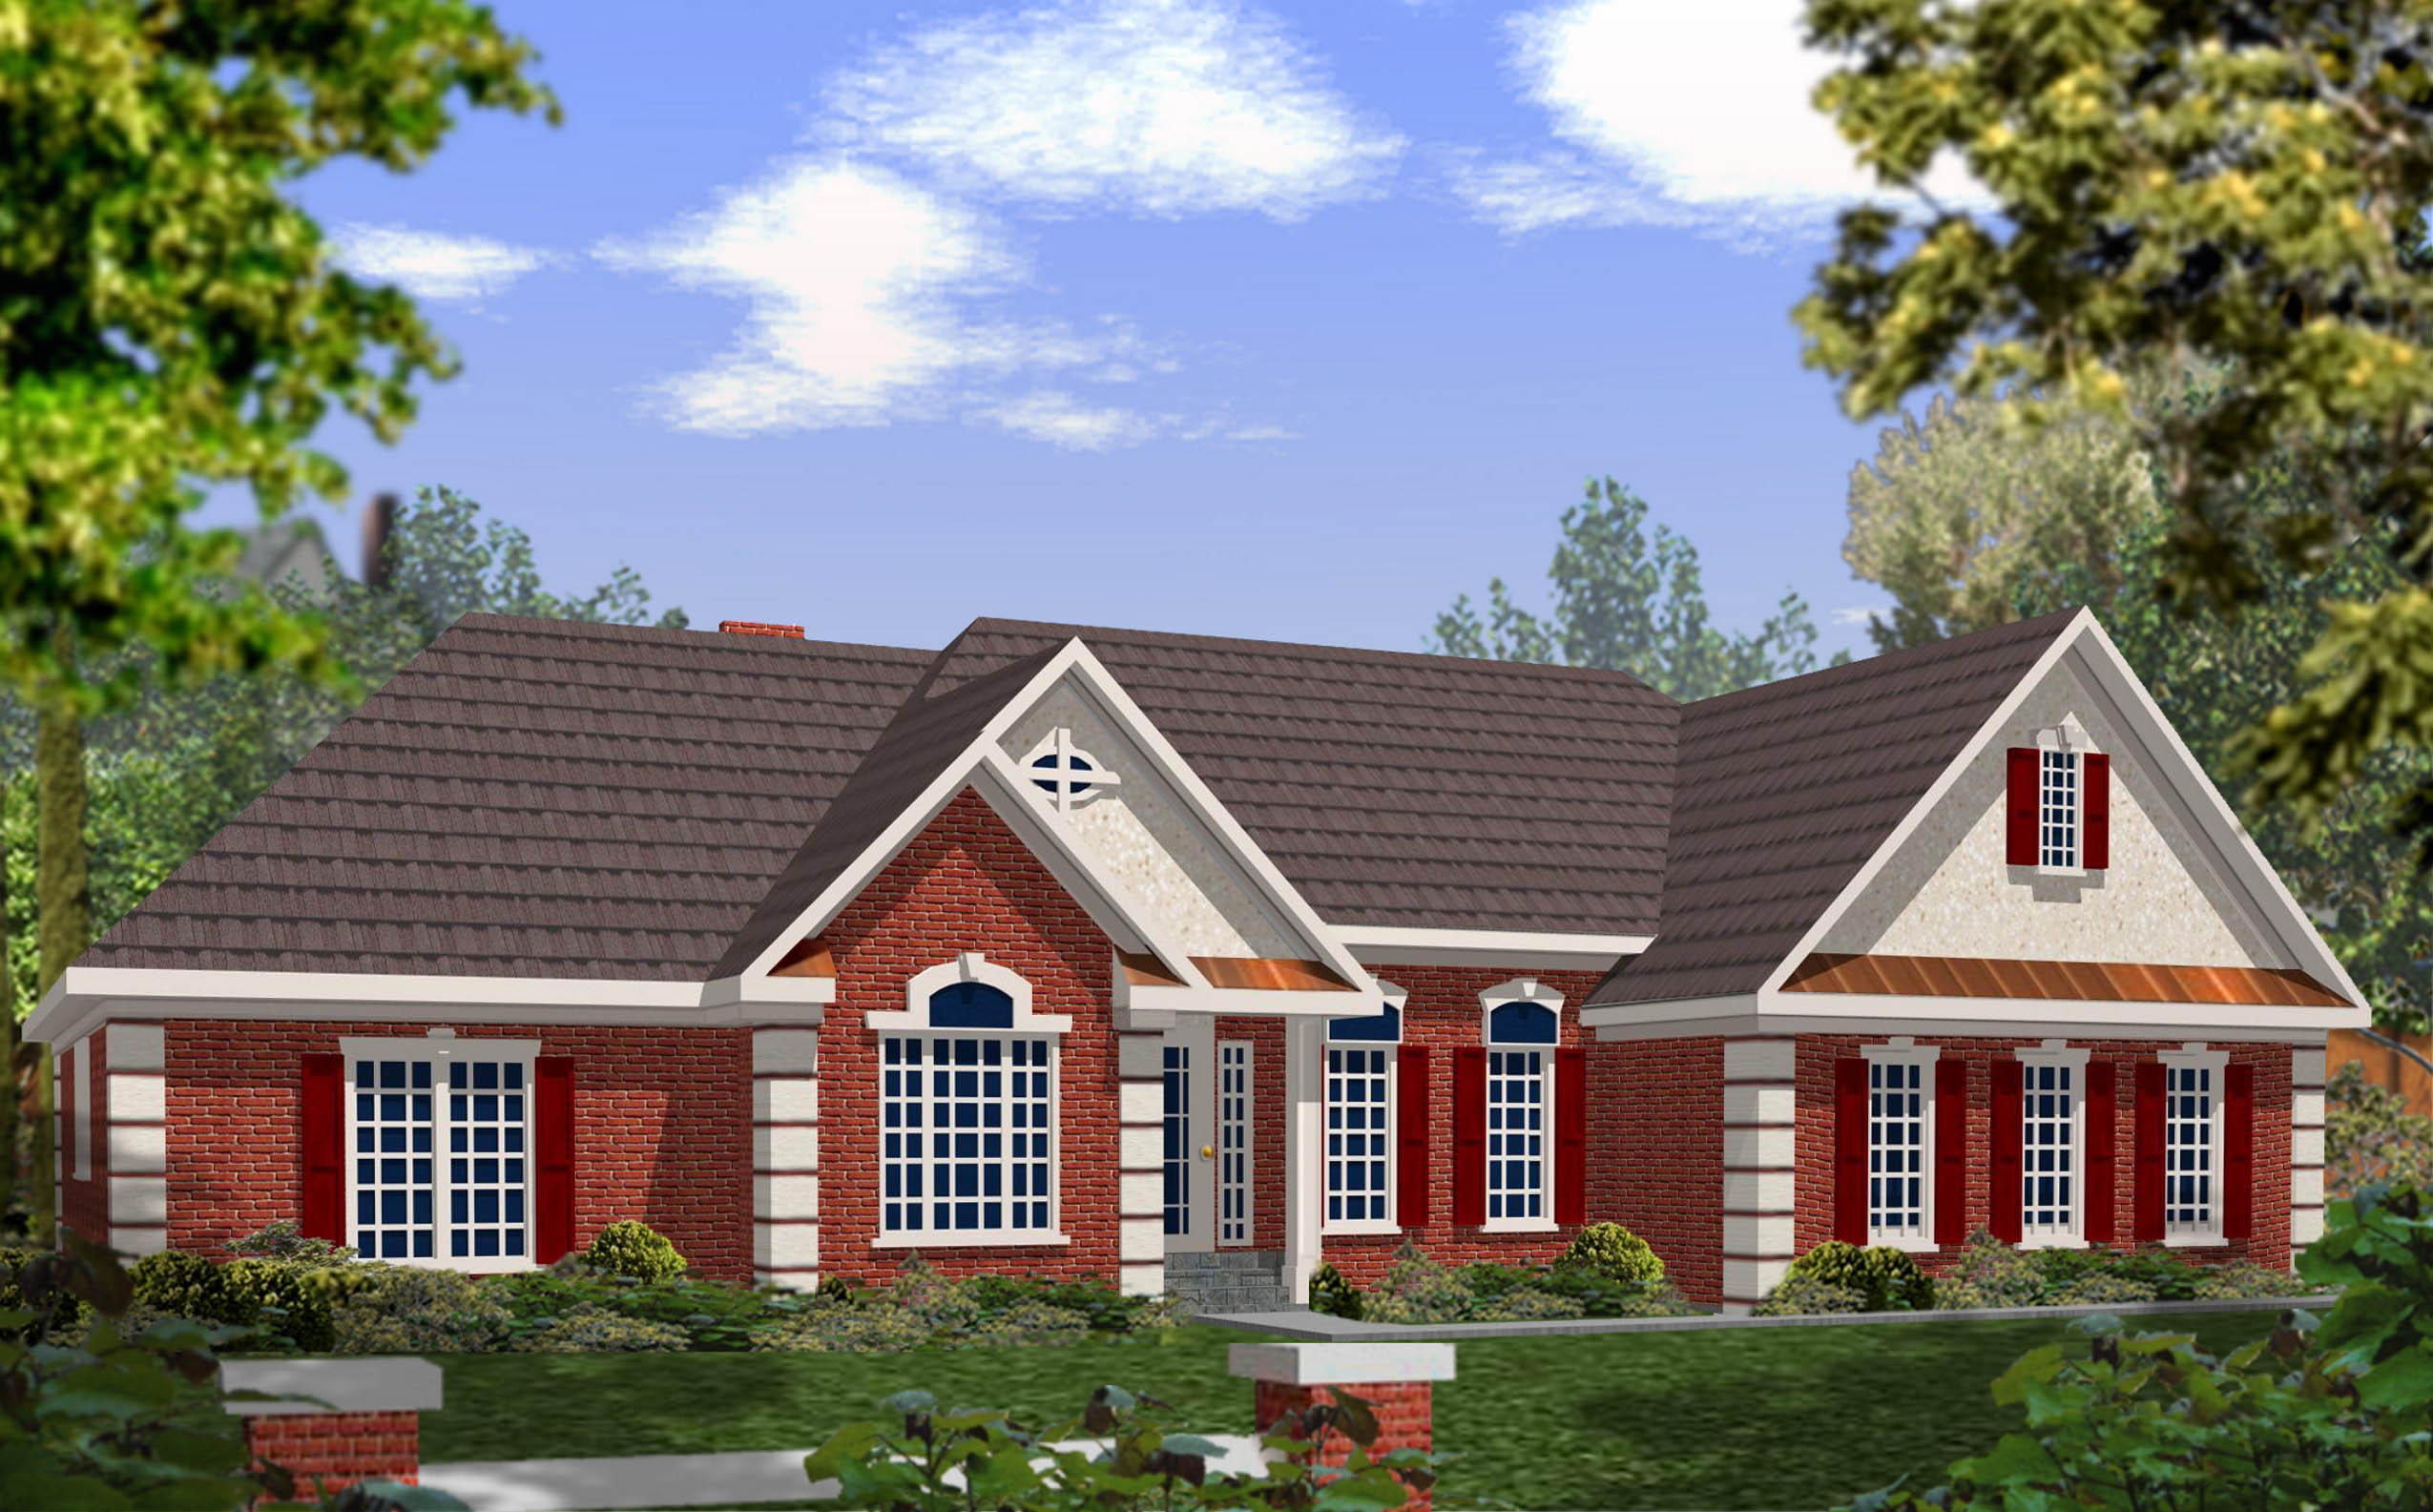 Dramatic Brick And Stucco Ranch - 2029ga Architectural